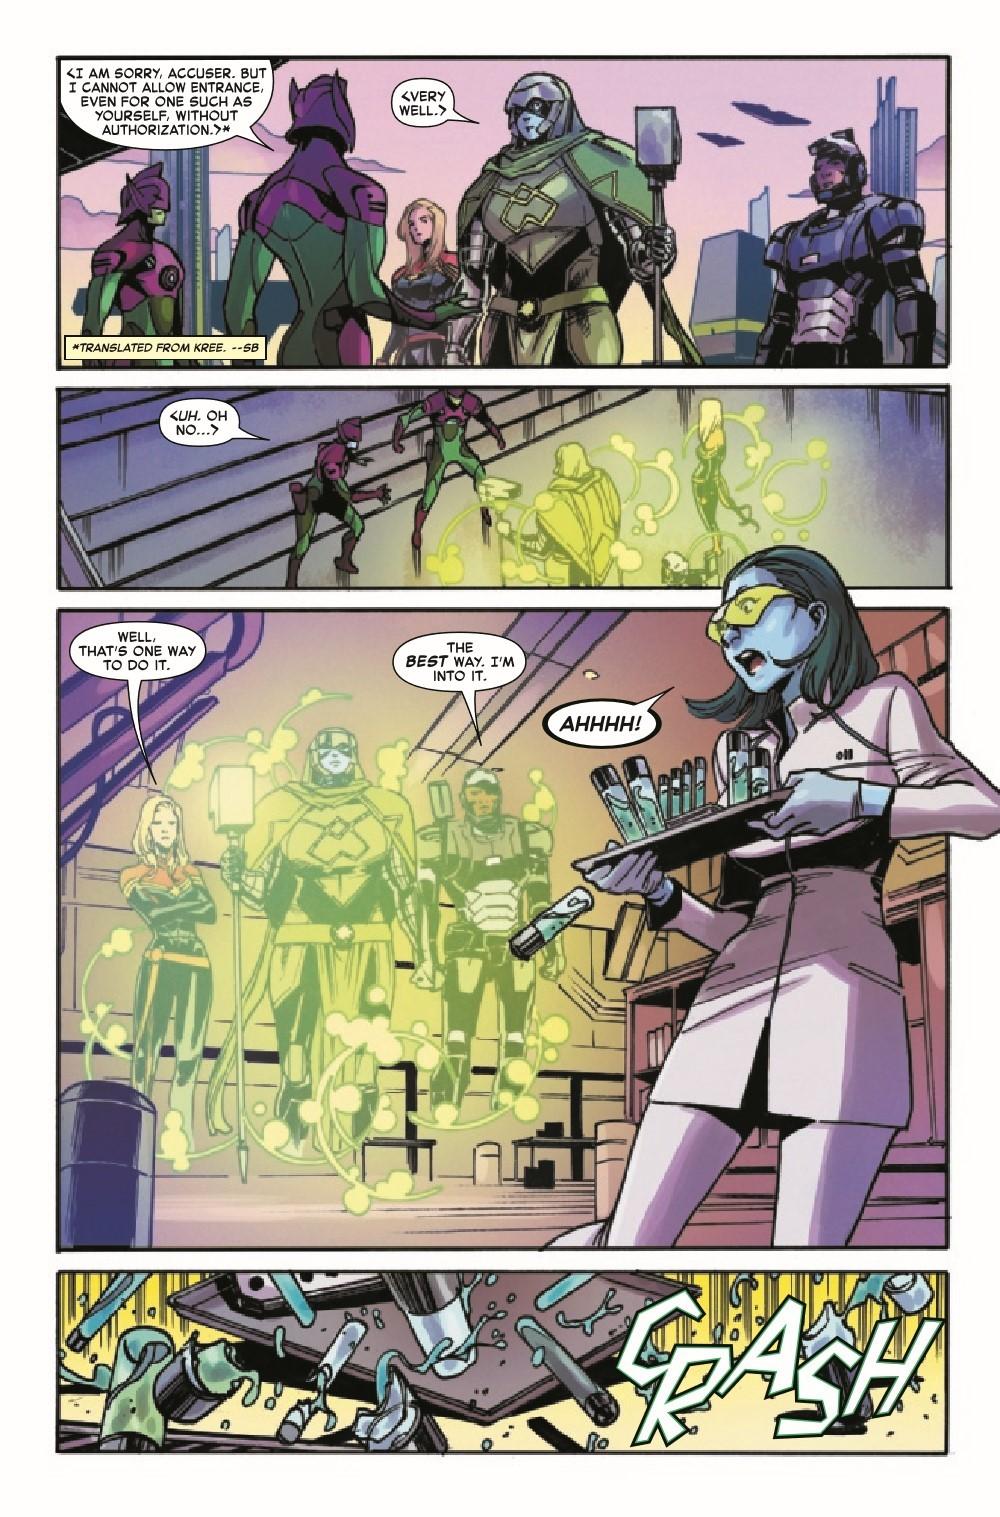 CAPMARV2019031_Preview-4 ComicList Previews: CAPTAIN MARVEL #31